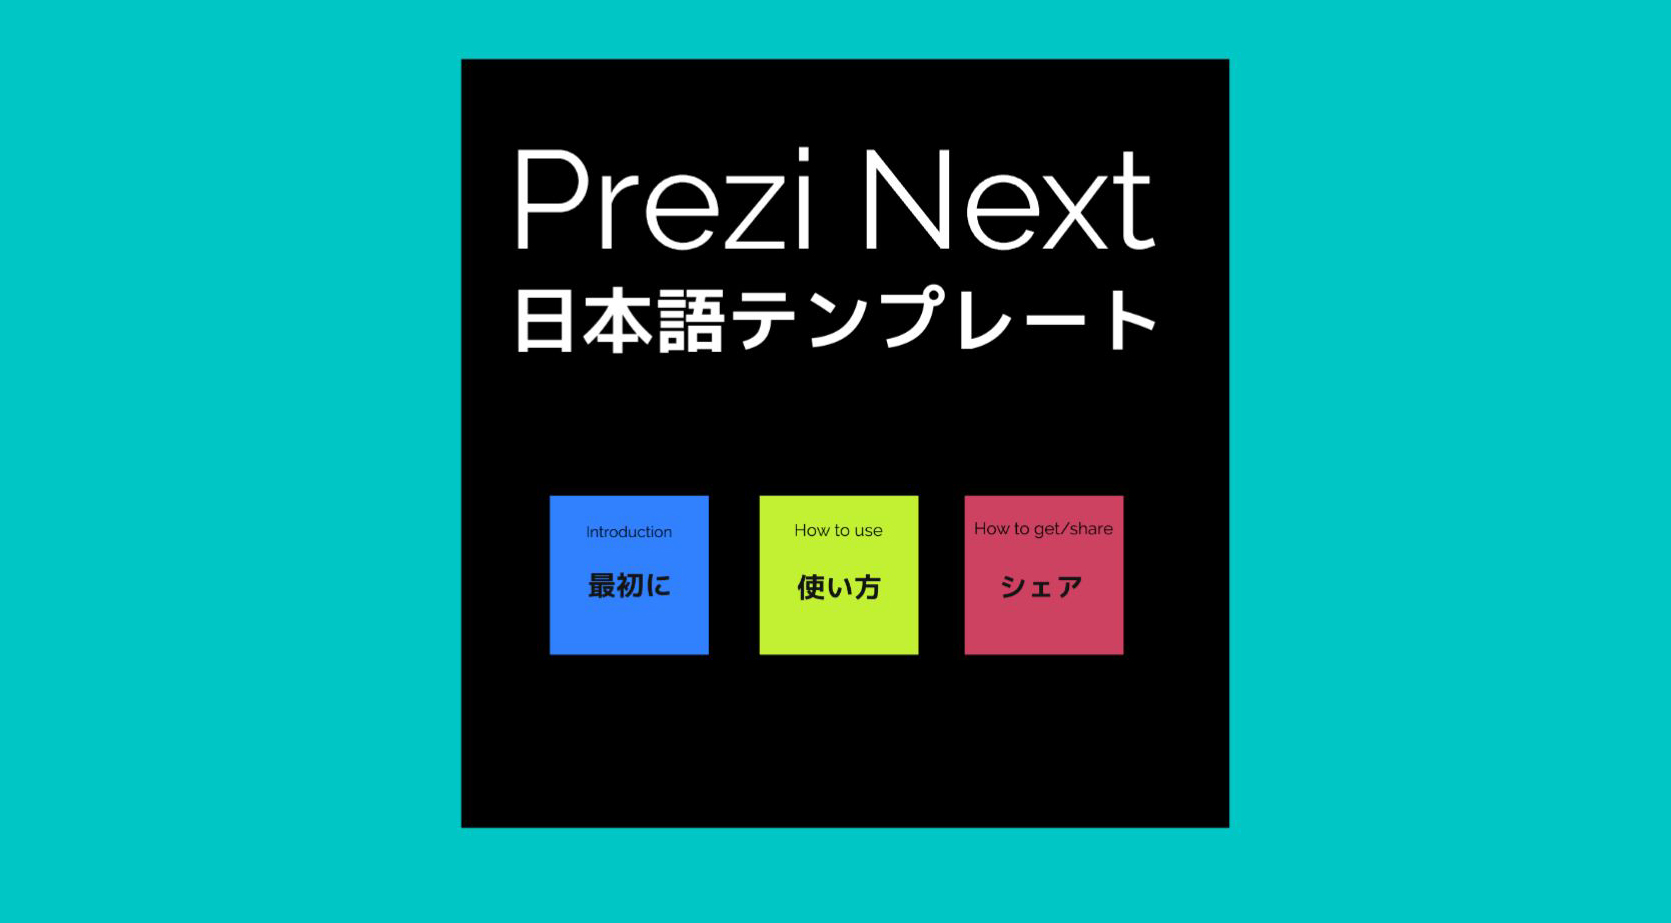 Prezi Next日本語テンプレートシェアプロジェクト!!